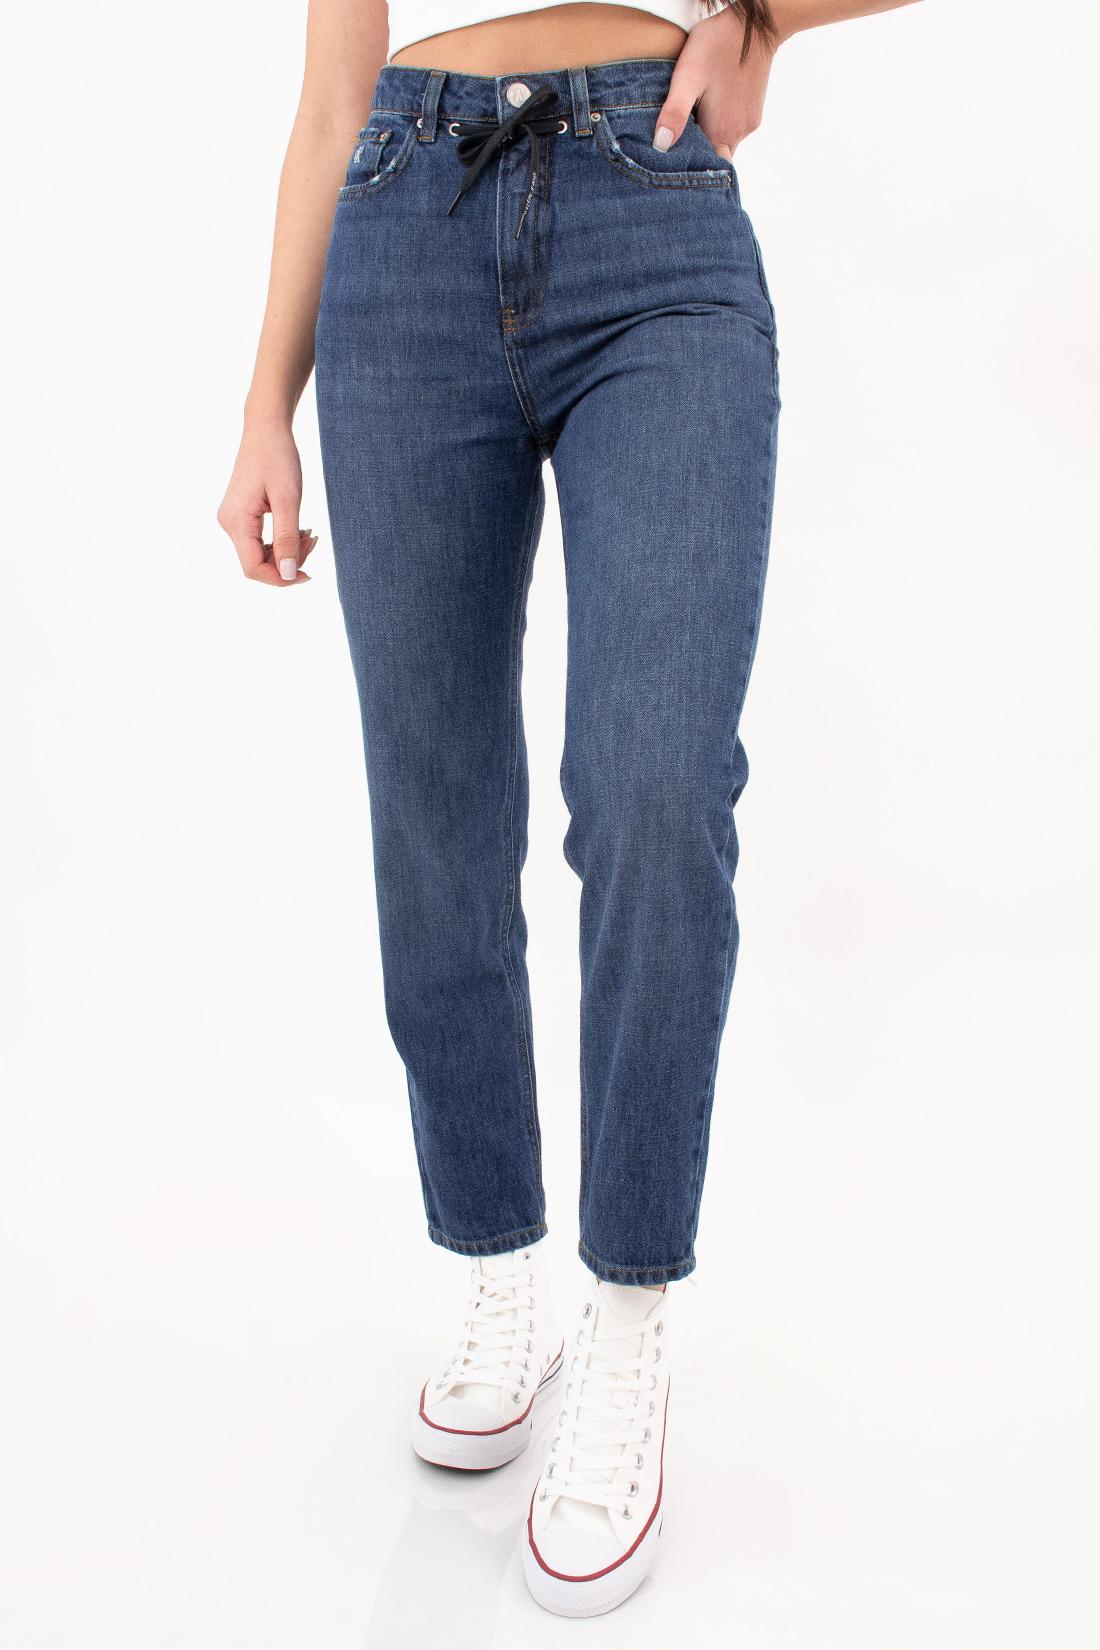 Calca Jeans Calvin Klein Mom Cadarço Global